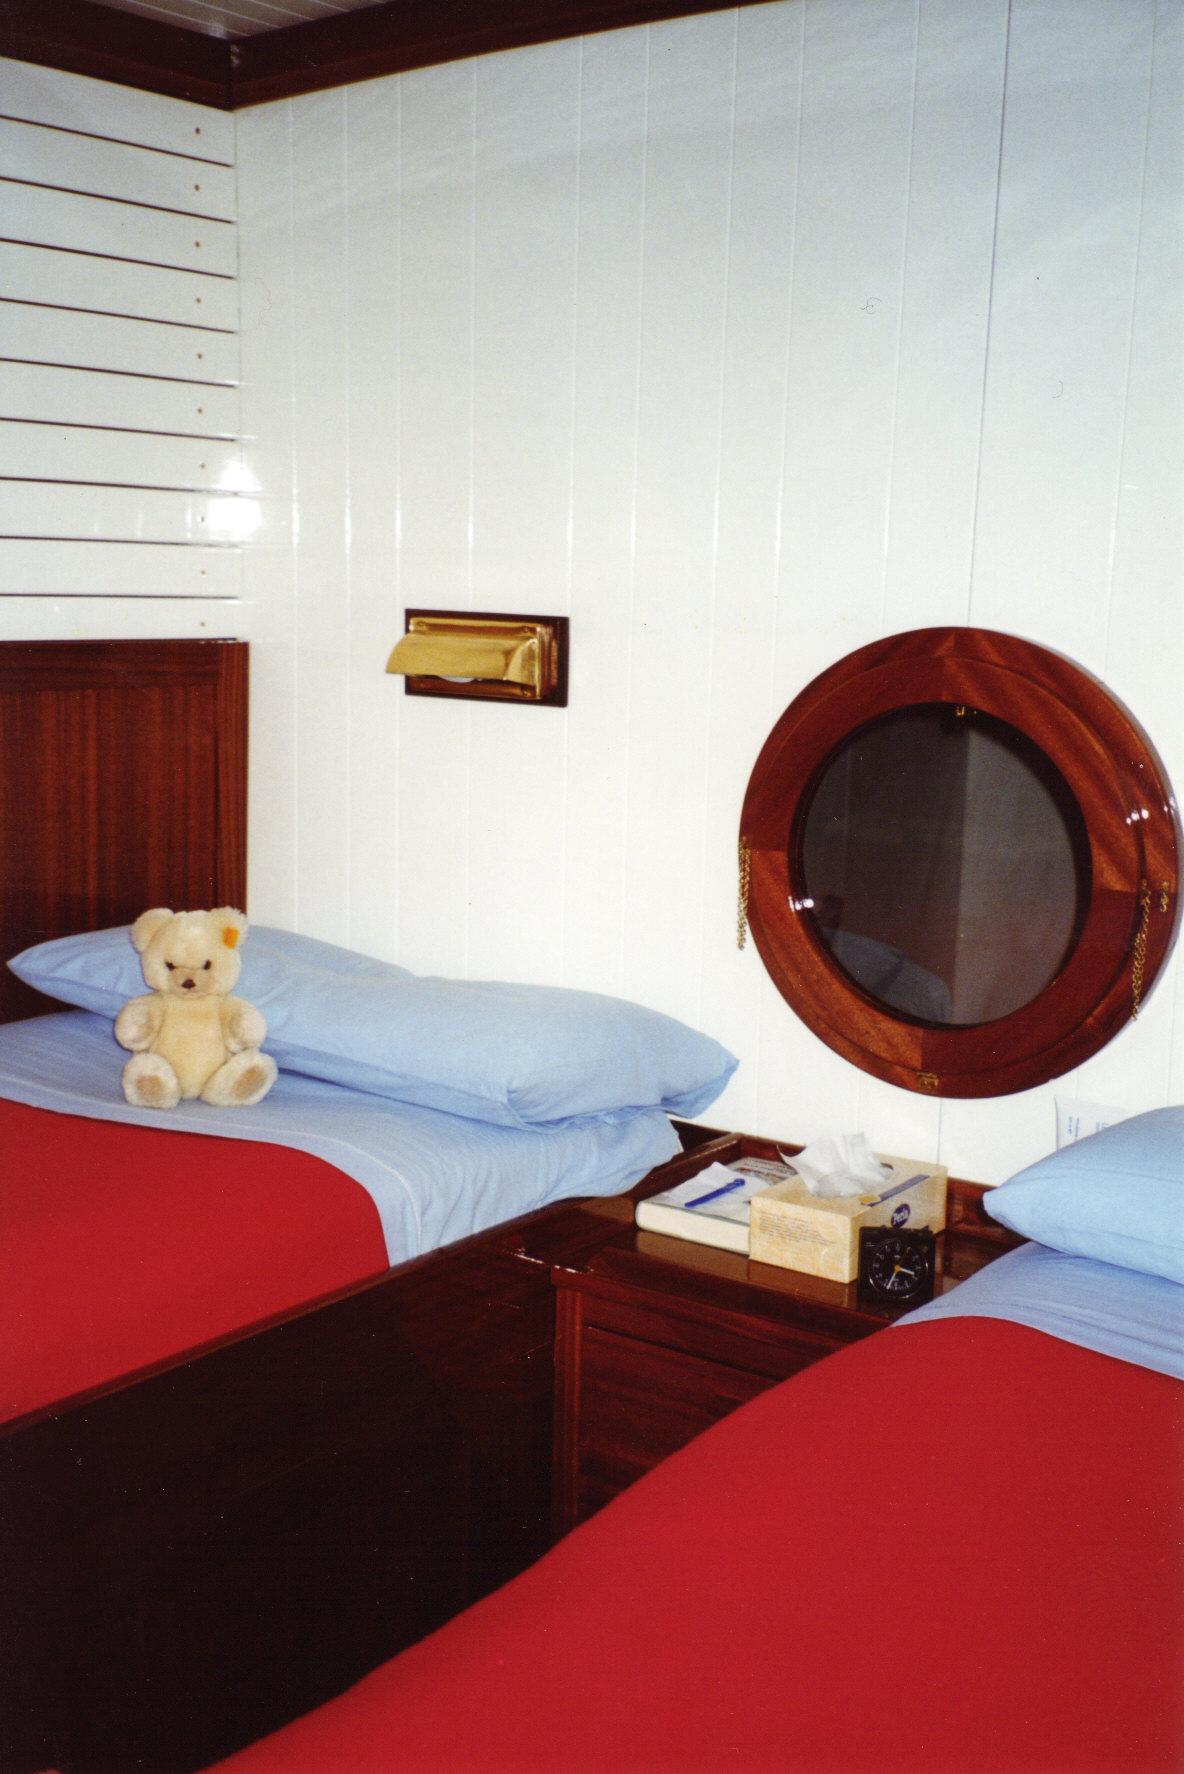 Cameretta stile marina falegnameria legno arredo milano for Tessuti arredo stile marina